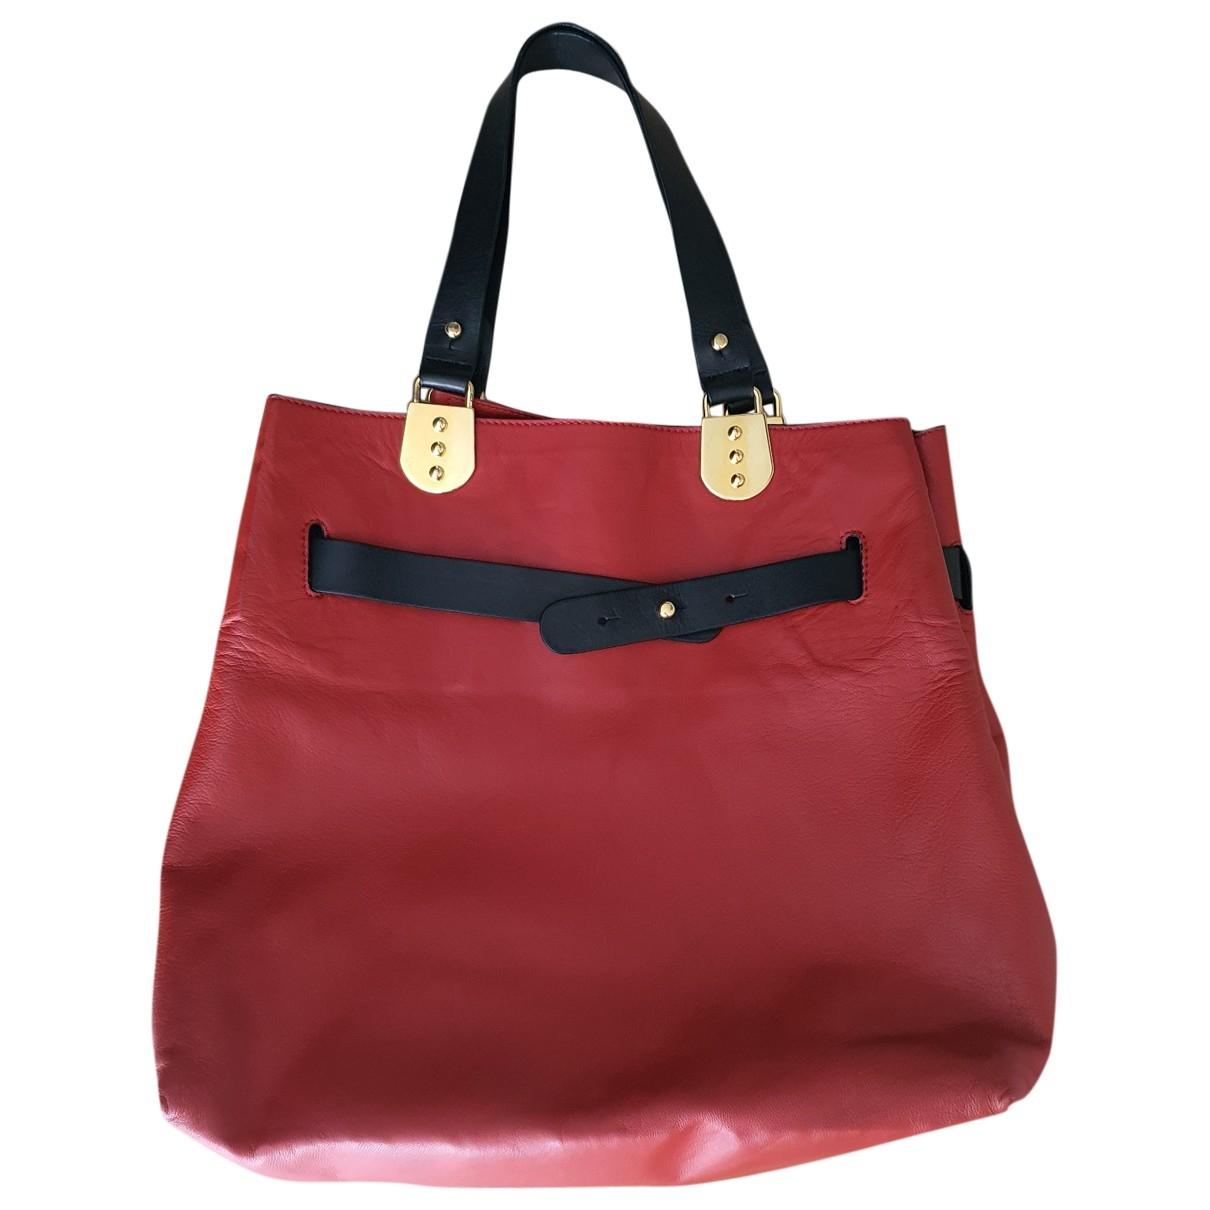 Christian Louboutin \N Red Leather handbag for Women \N